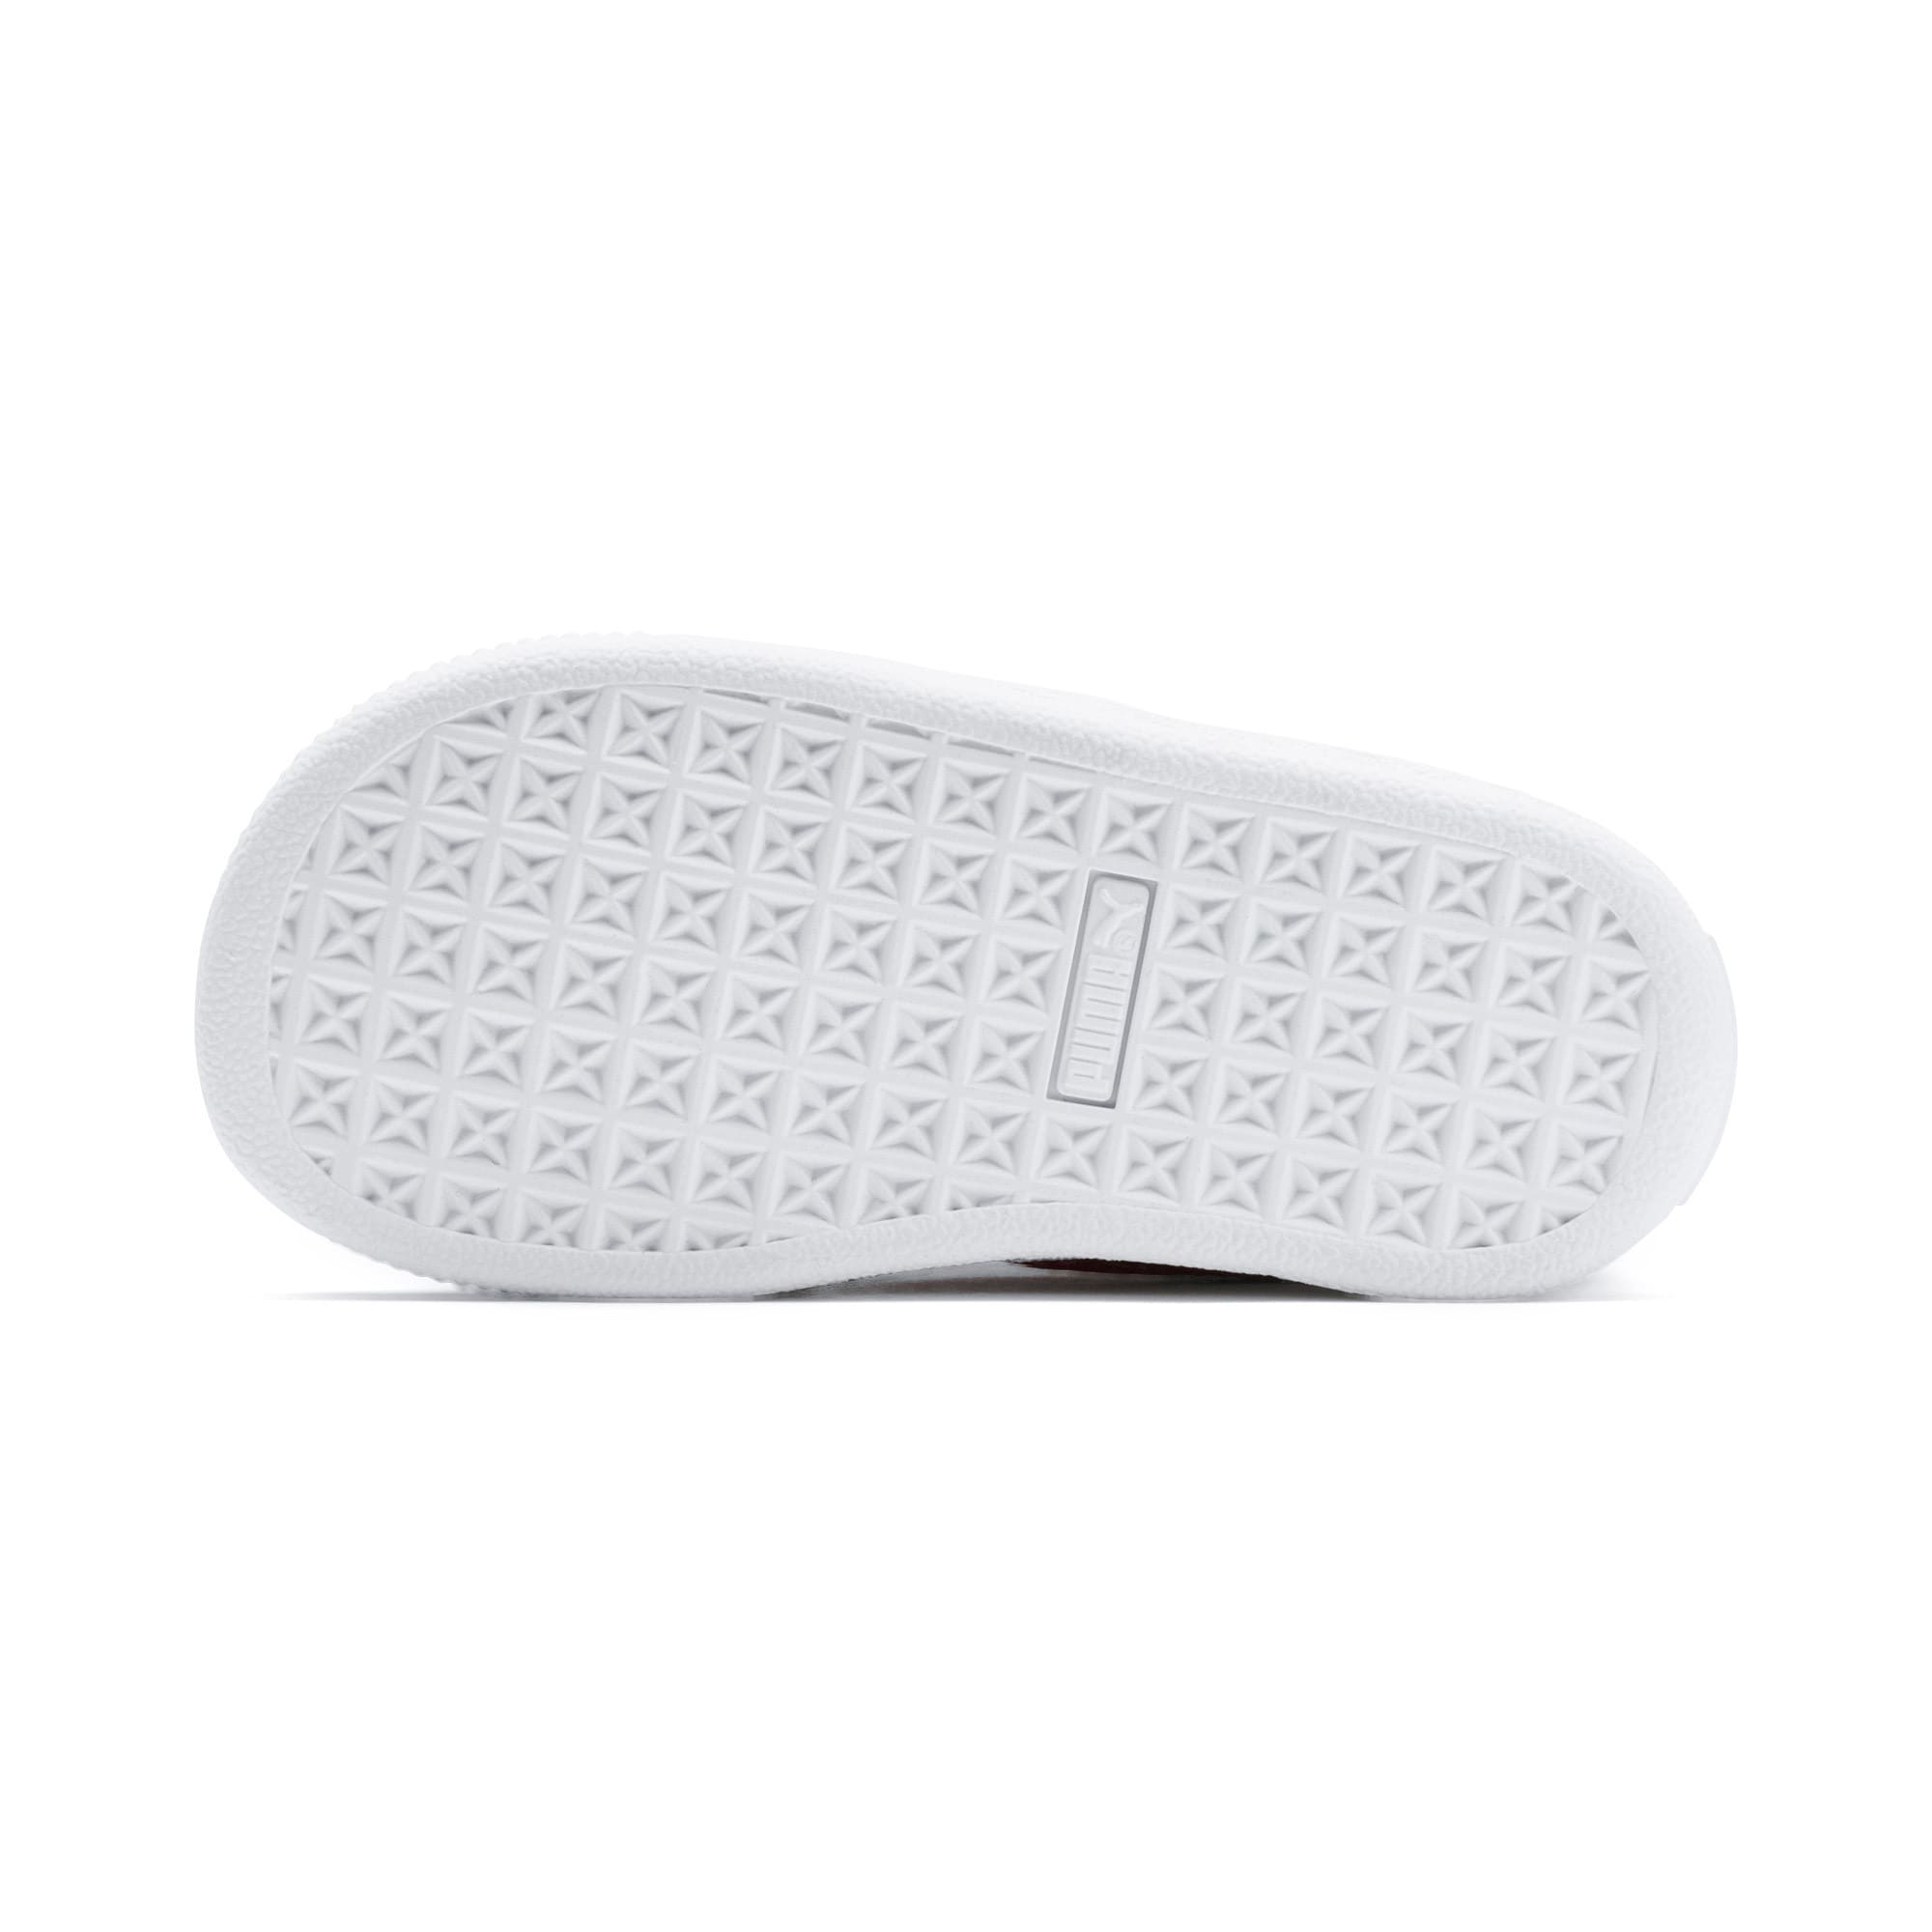 Miniatura 4 de ZapatosPUMA x SOPHIA WEBSTER Basket para bebés, Puma White-Pale Pink, mediano